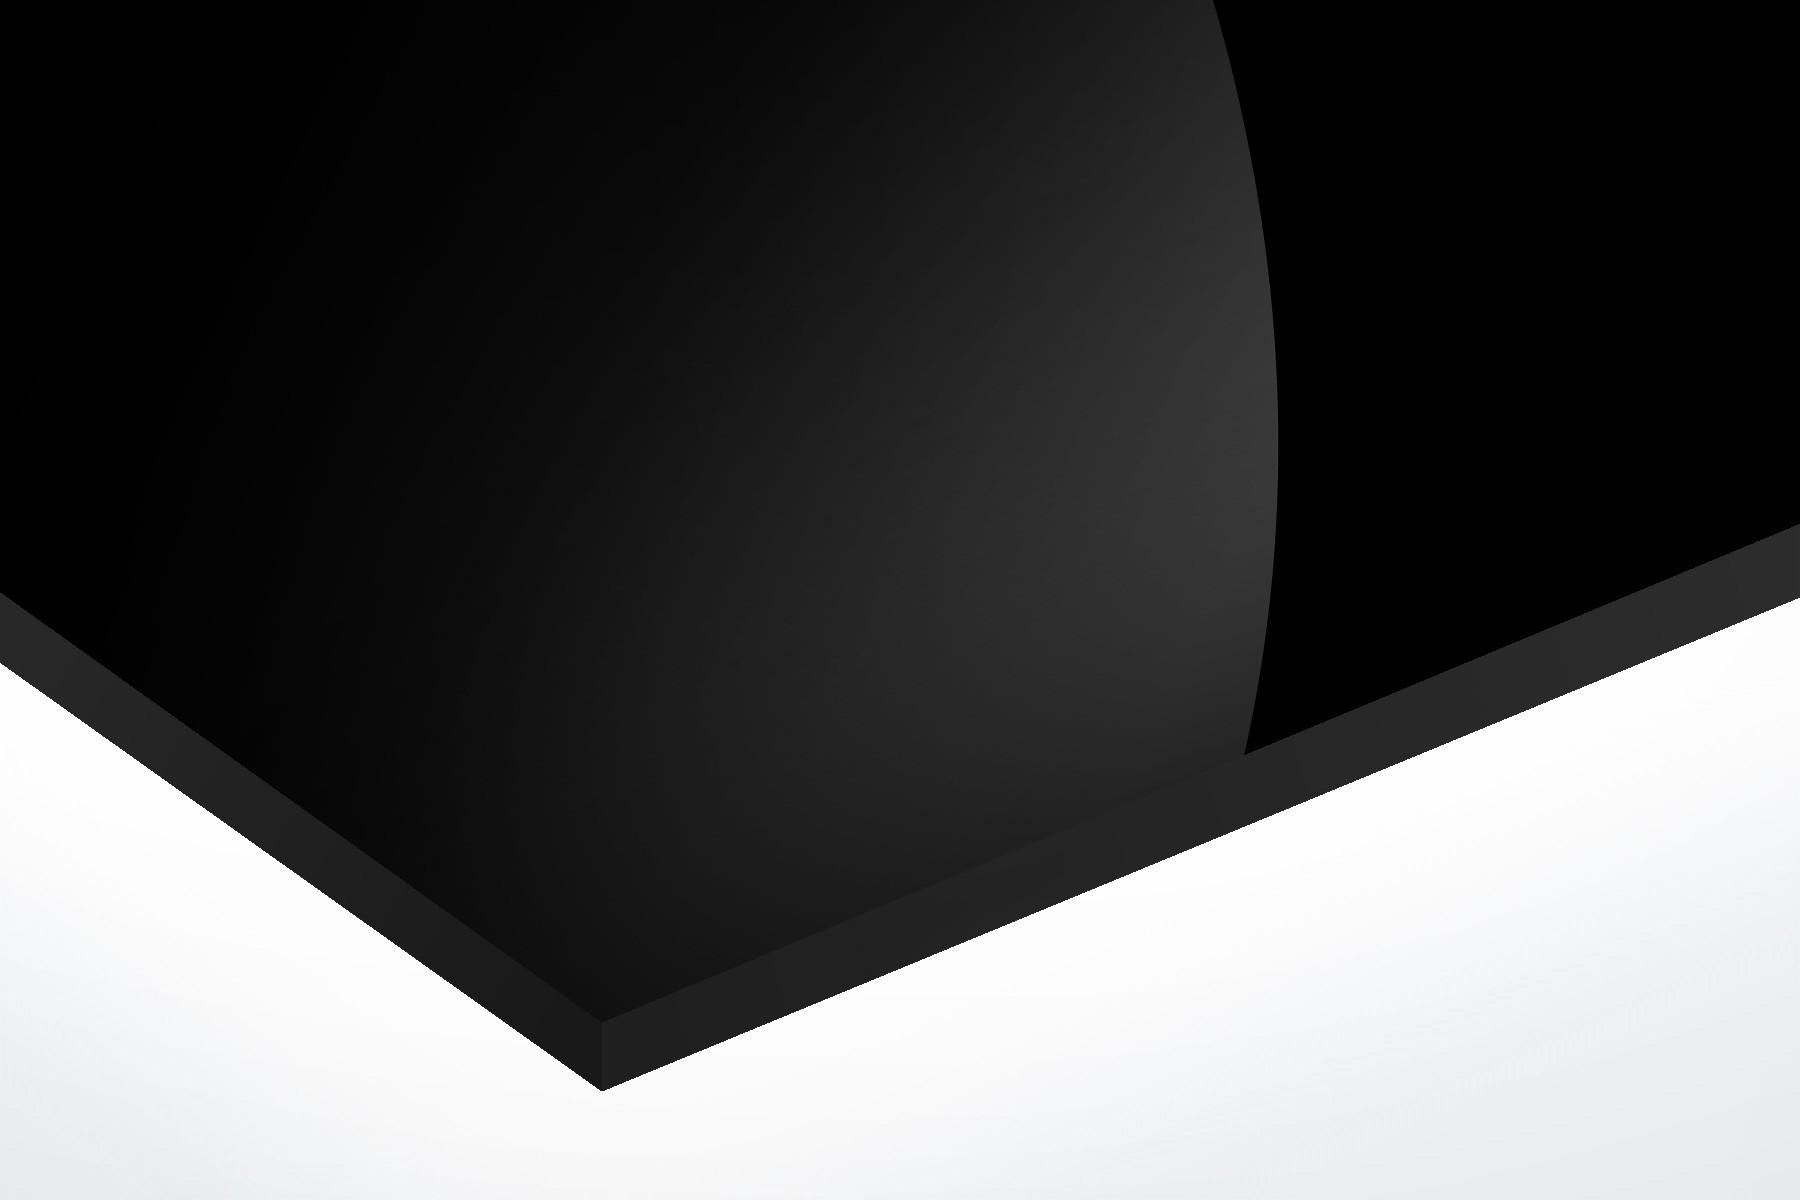 Anodised Aluminium Black, Gloss 1mm x 1000mm x 500mm